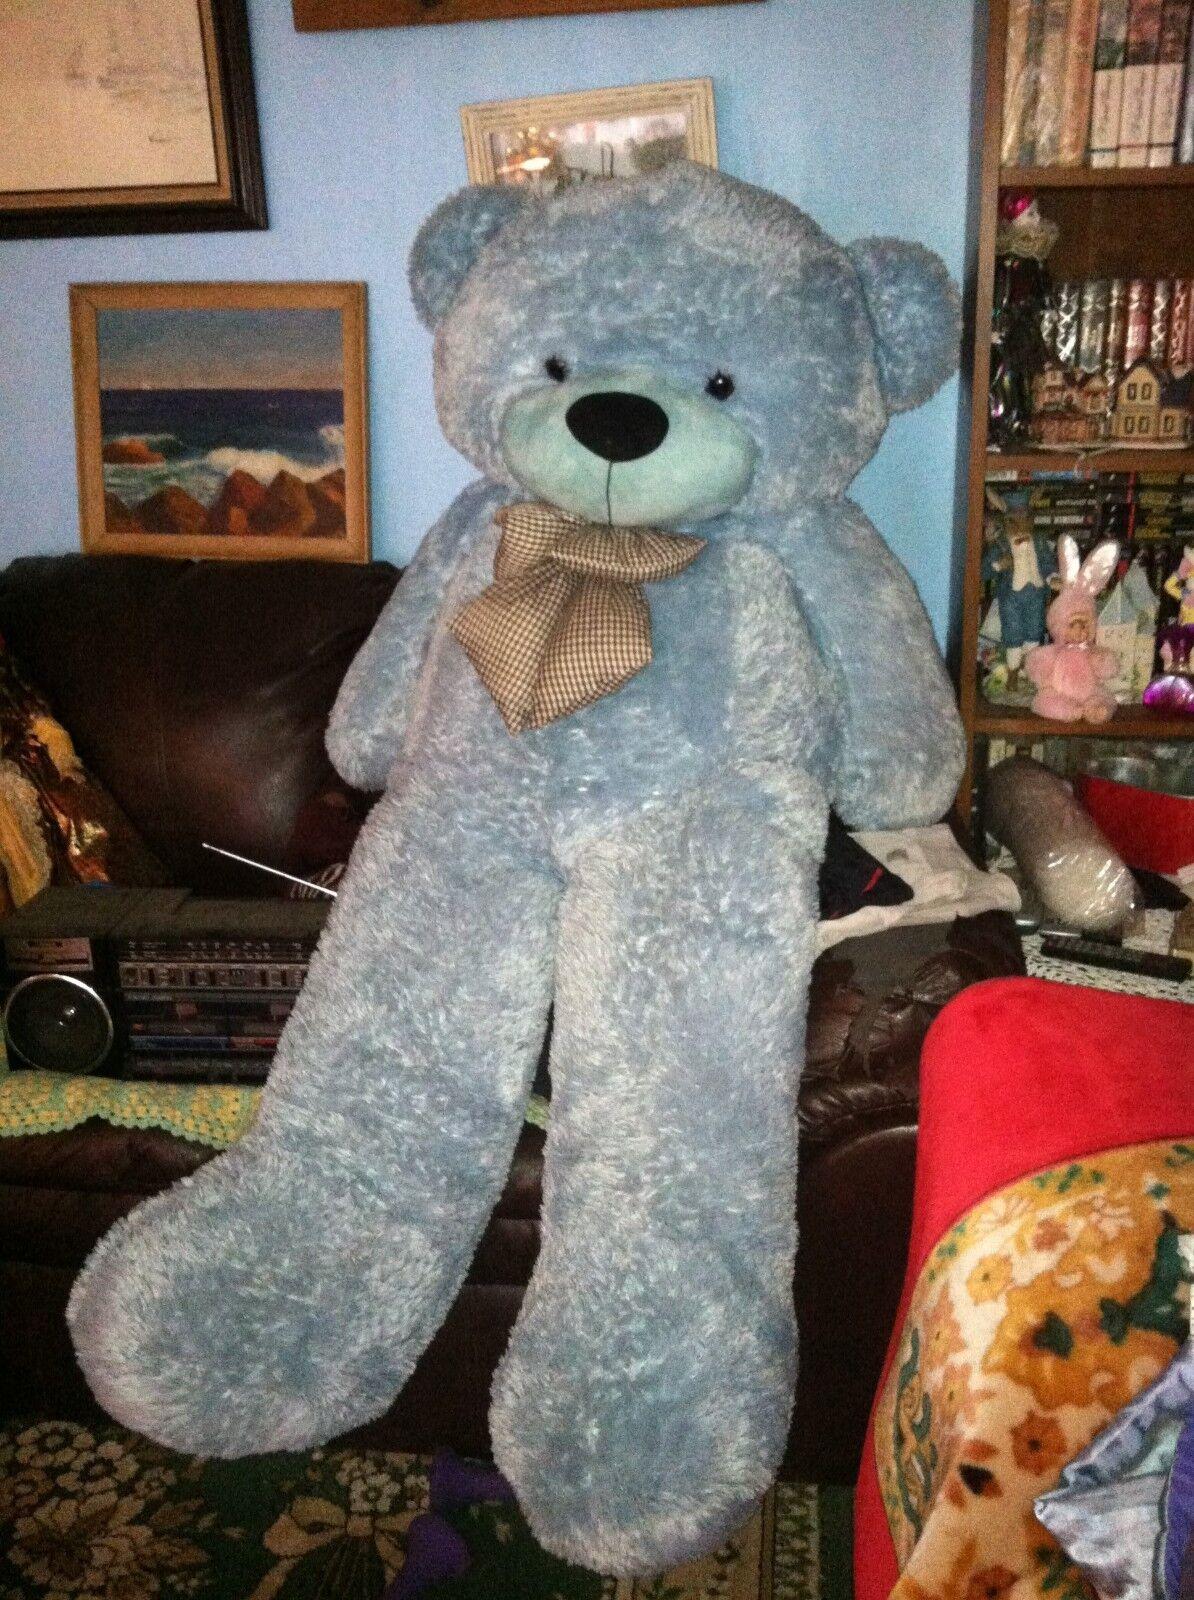 GiANT TEDDY BEAR 4 FETT REAL JUMBO Fylld Animal leksak tillverkad i USA